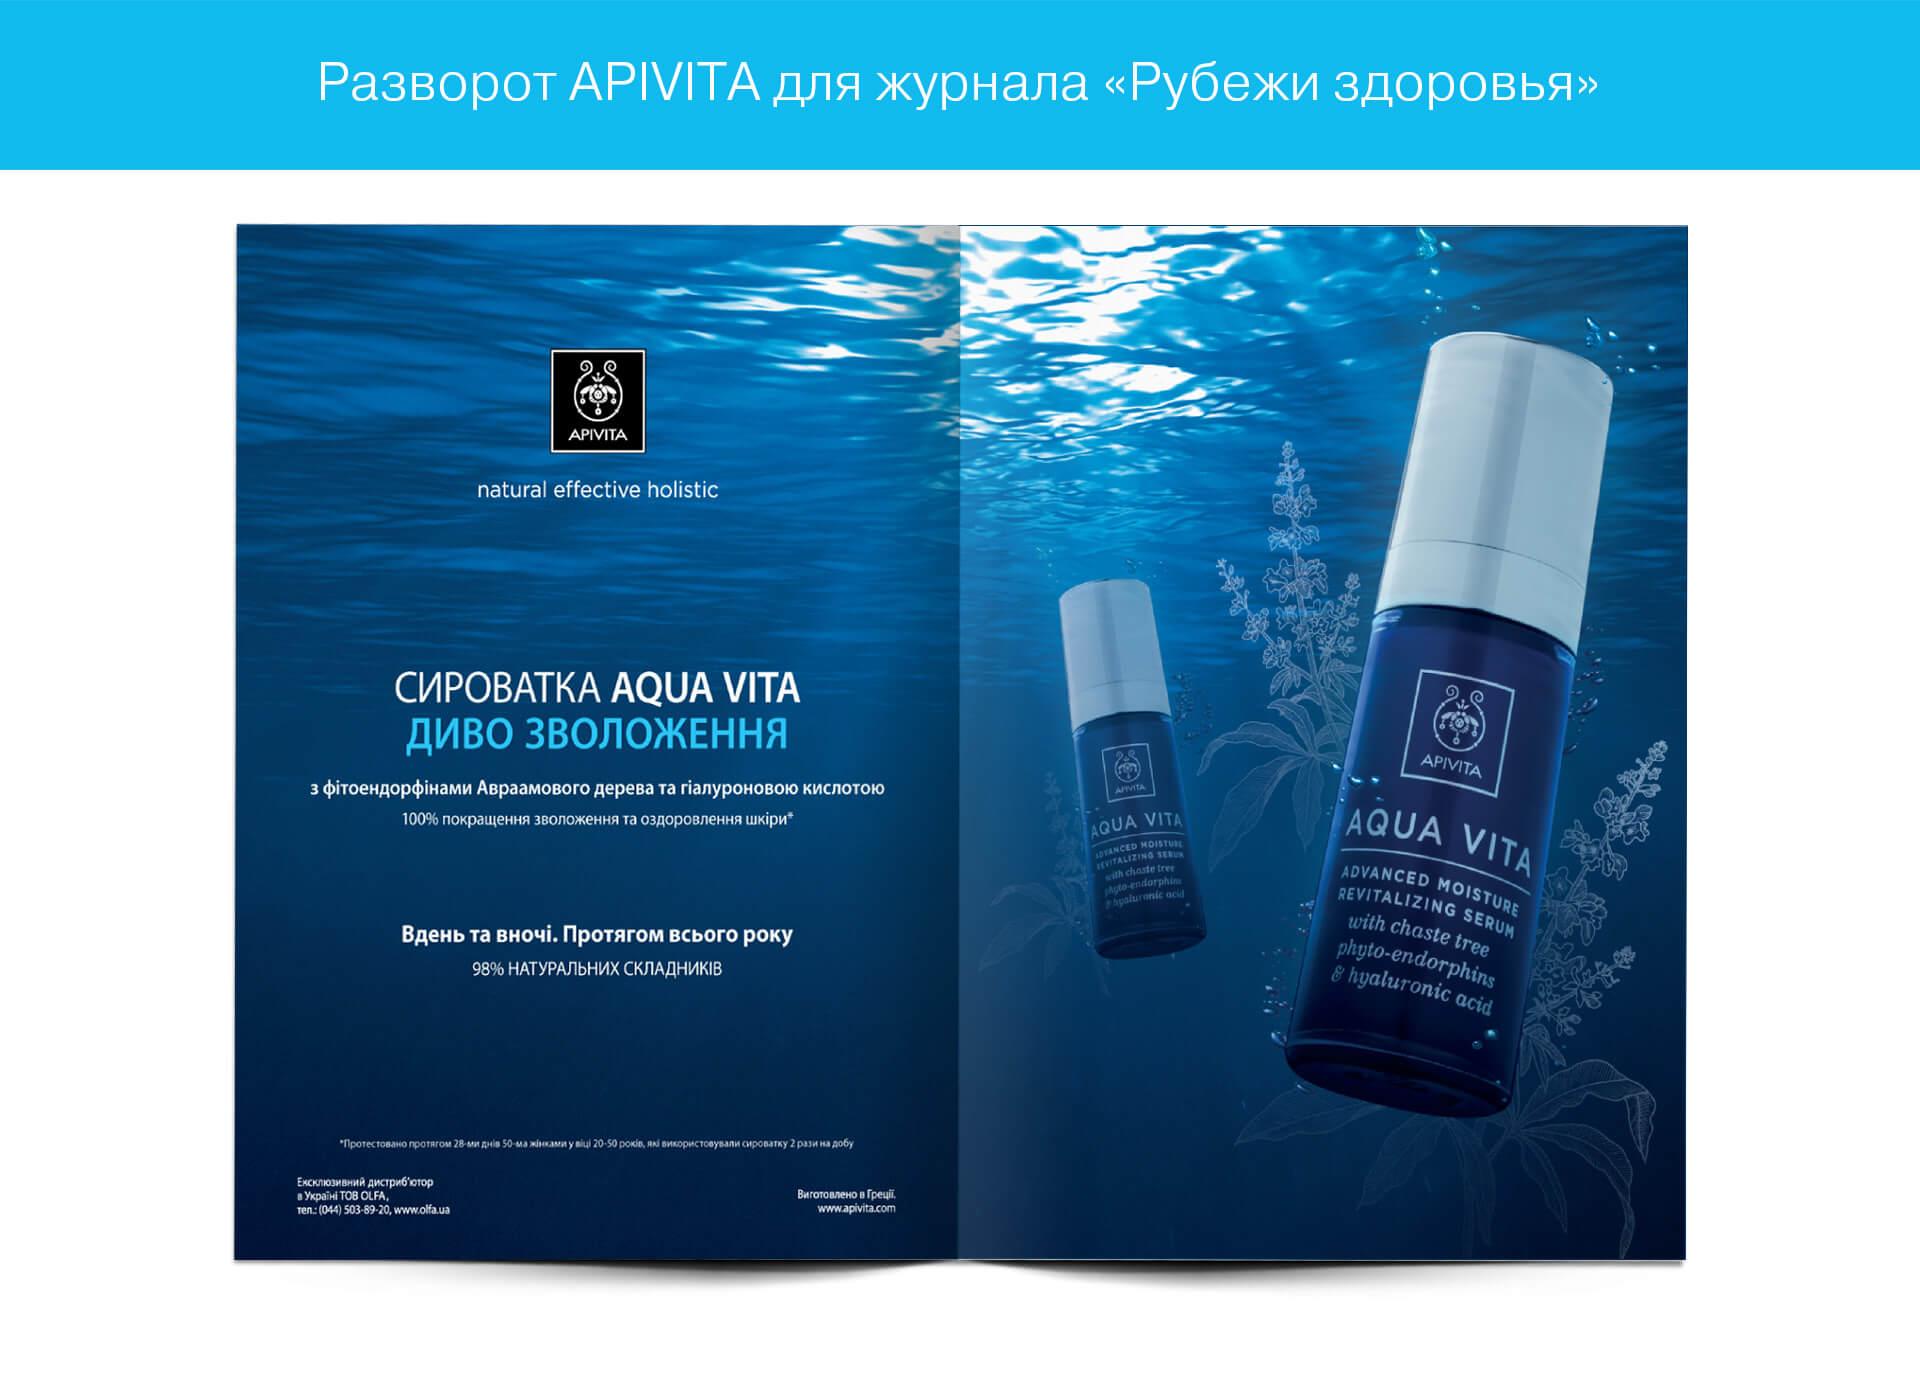 Prokochuk_Irina_Apivita_magazine_RZ_1_1